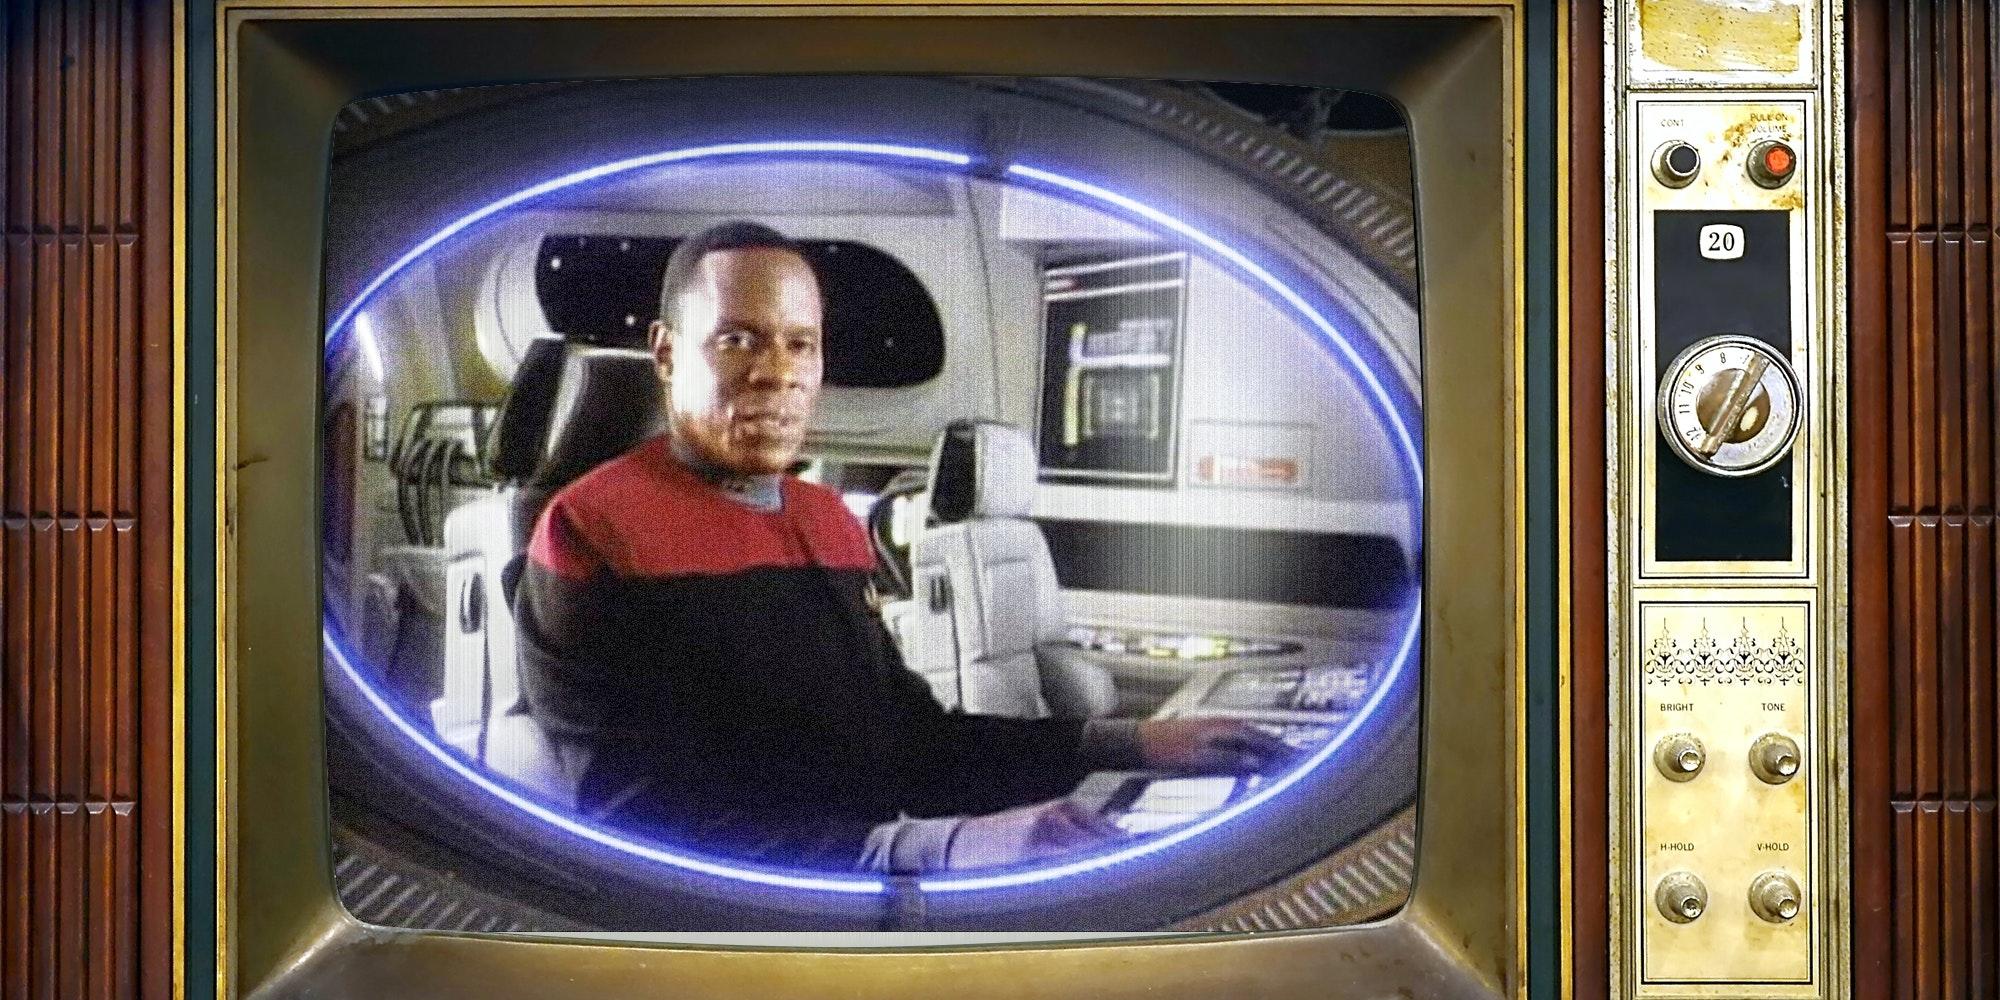 Star Trek: Deep Space 9 on old analog television set